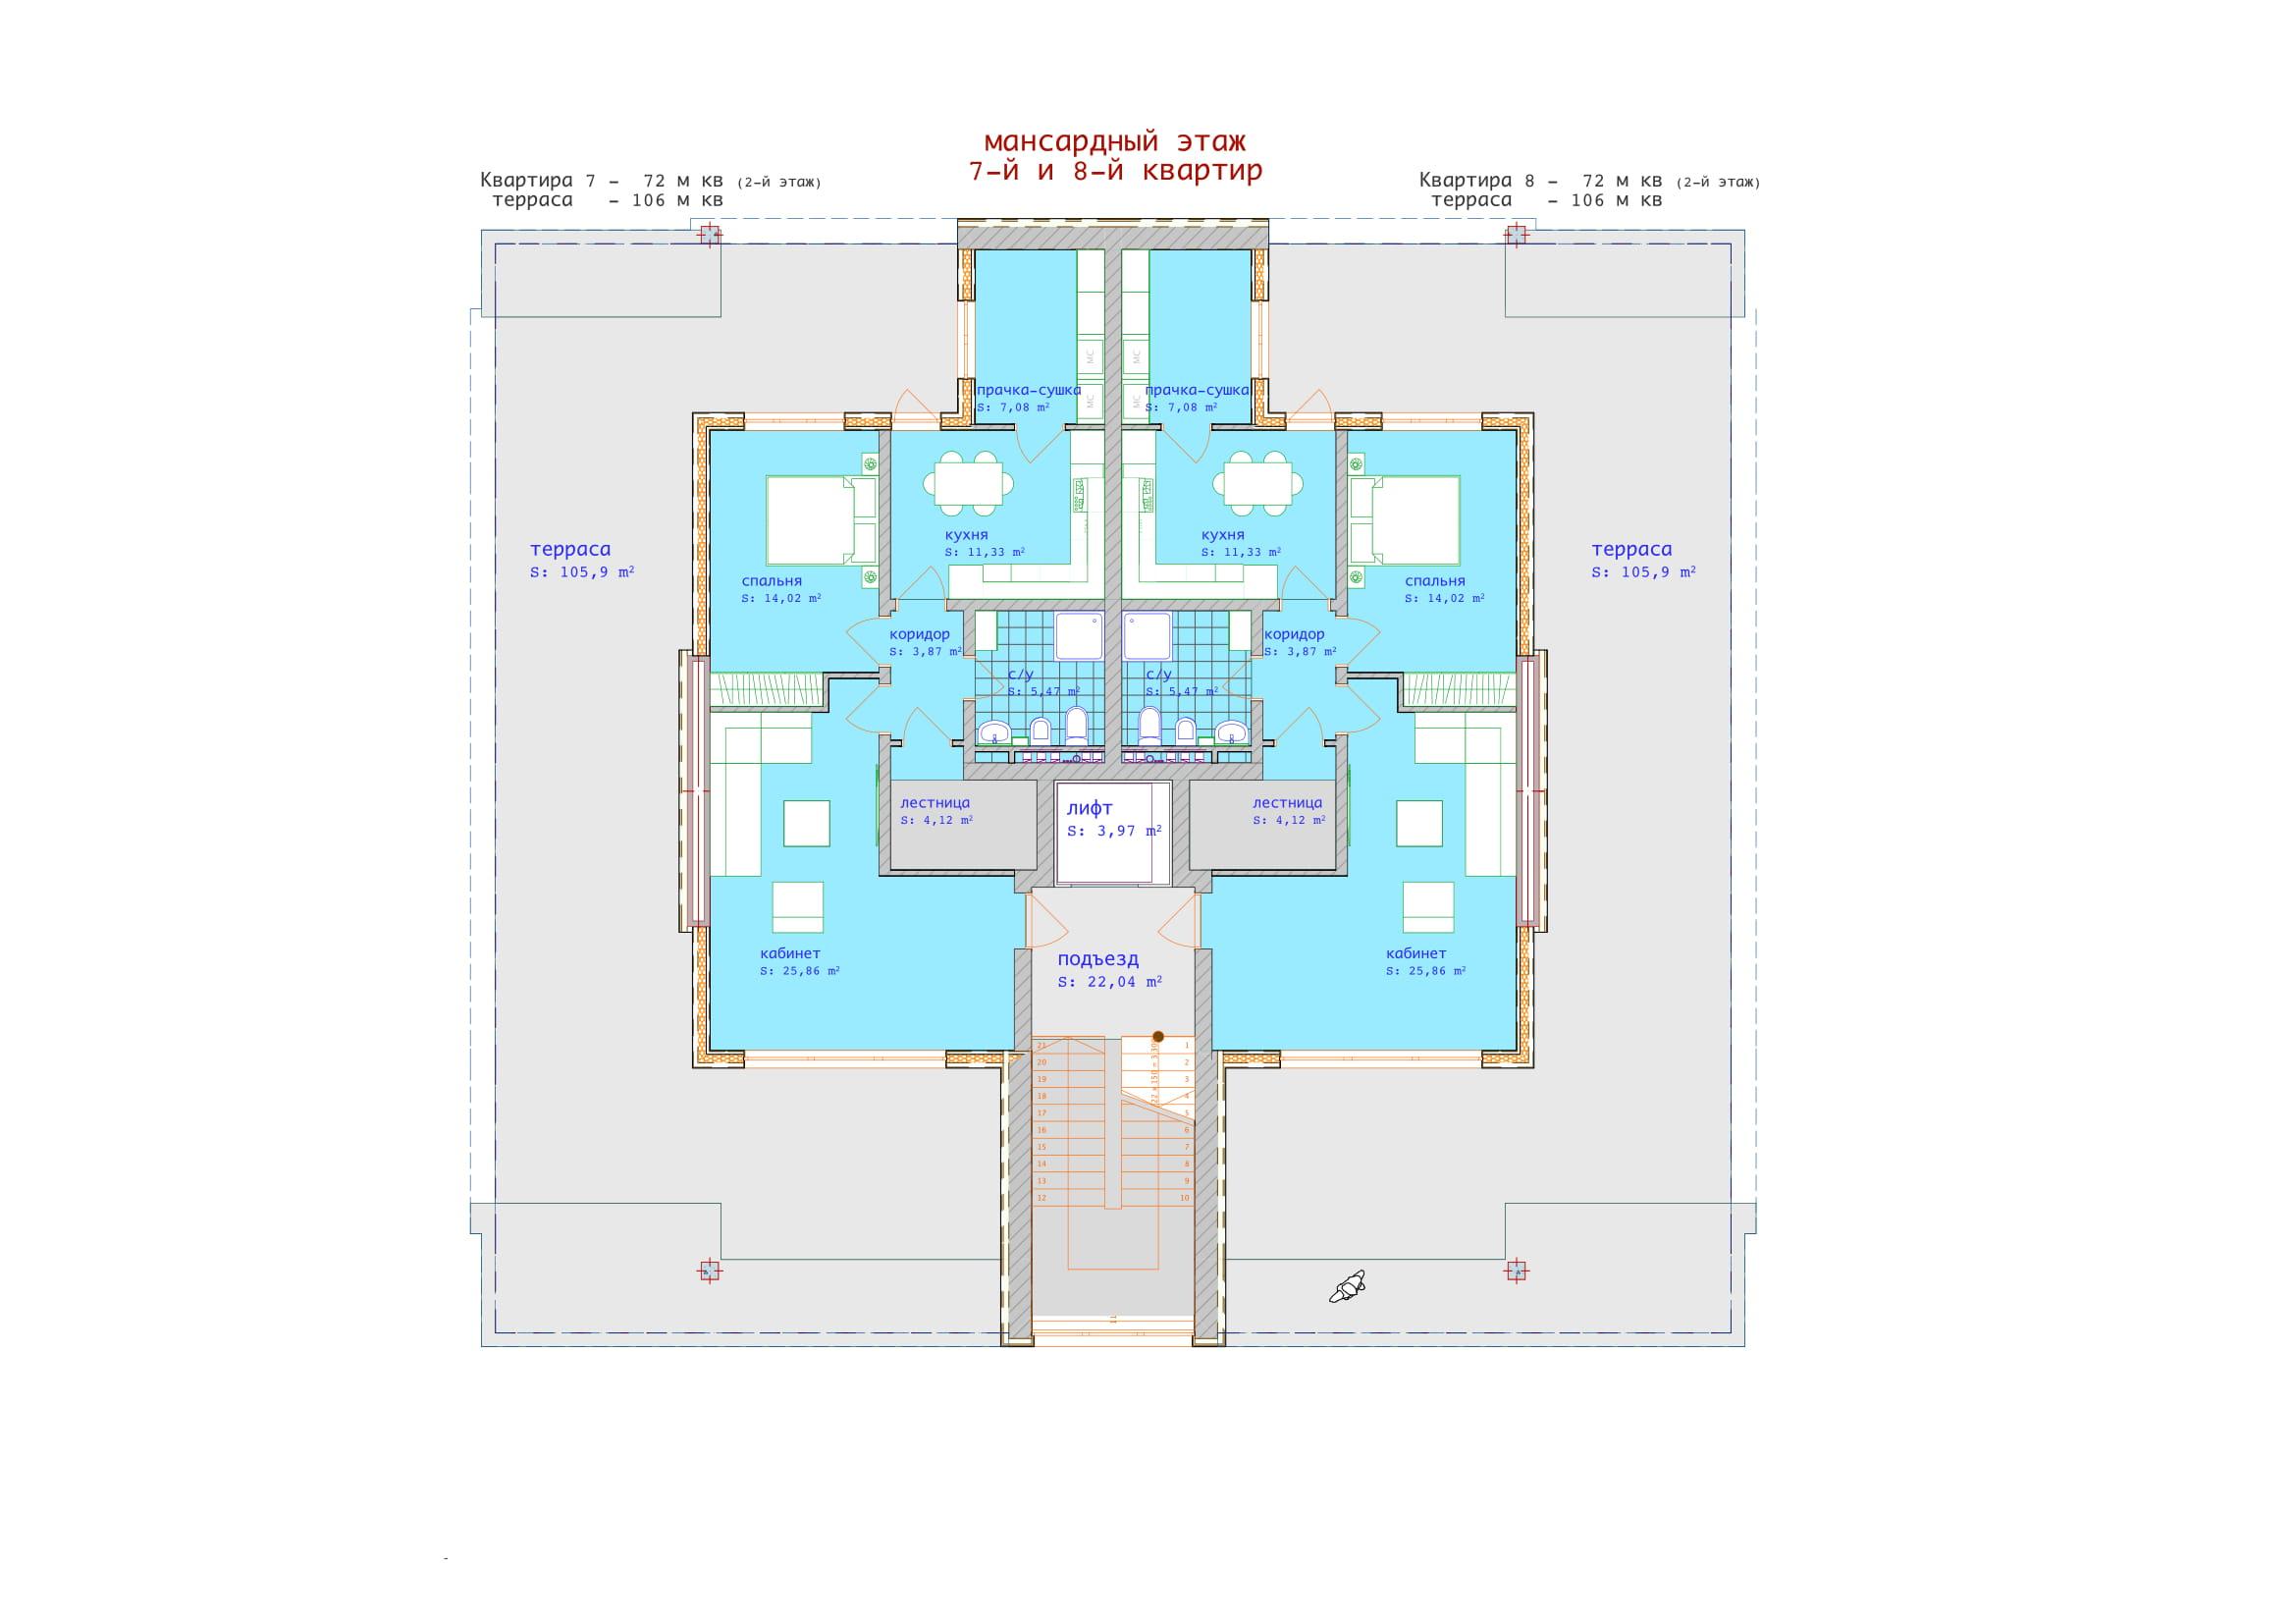 Penthouse 2nd floor